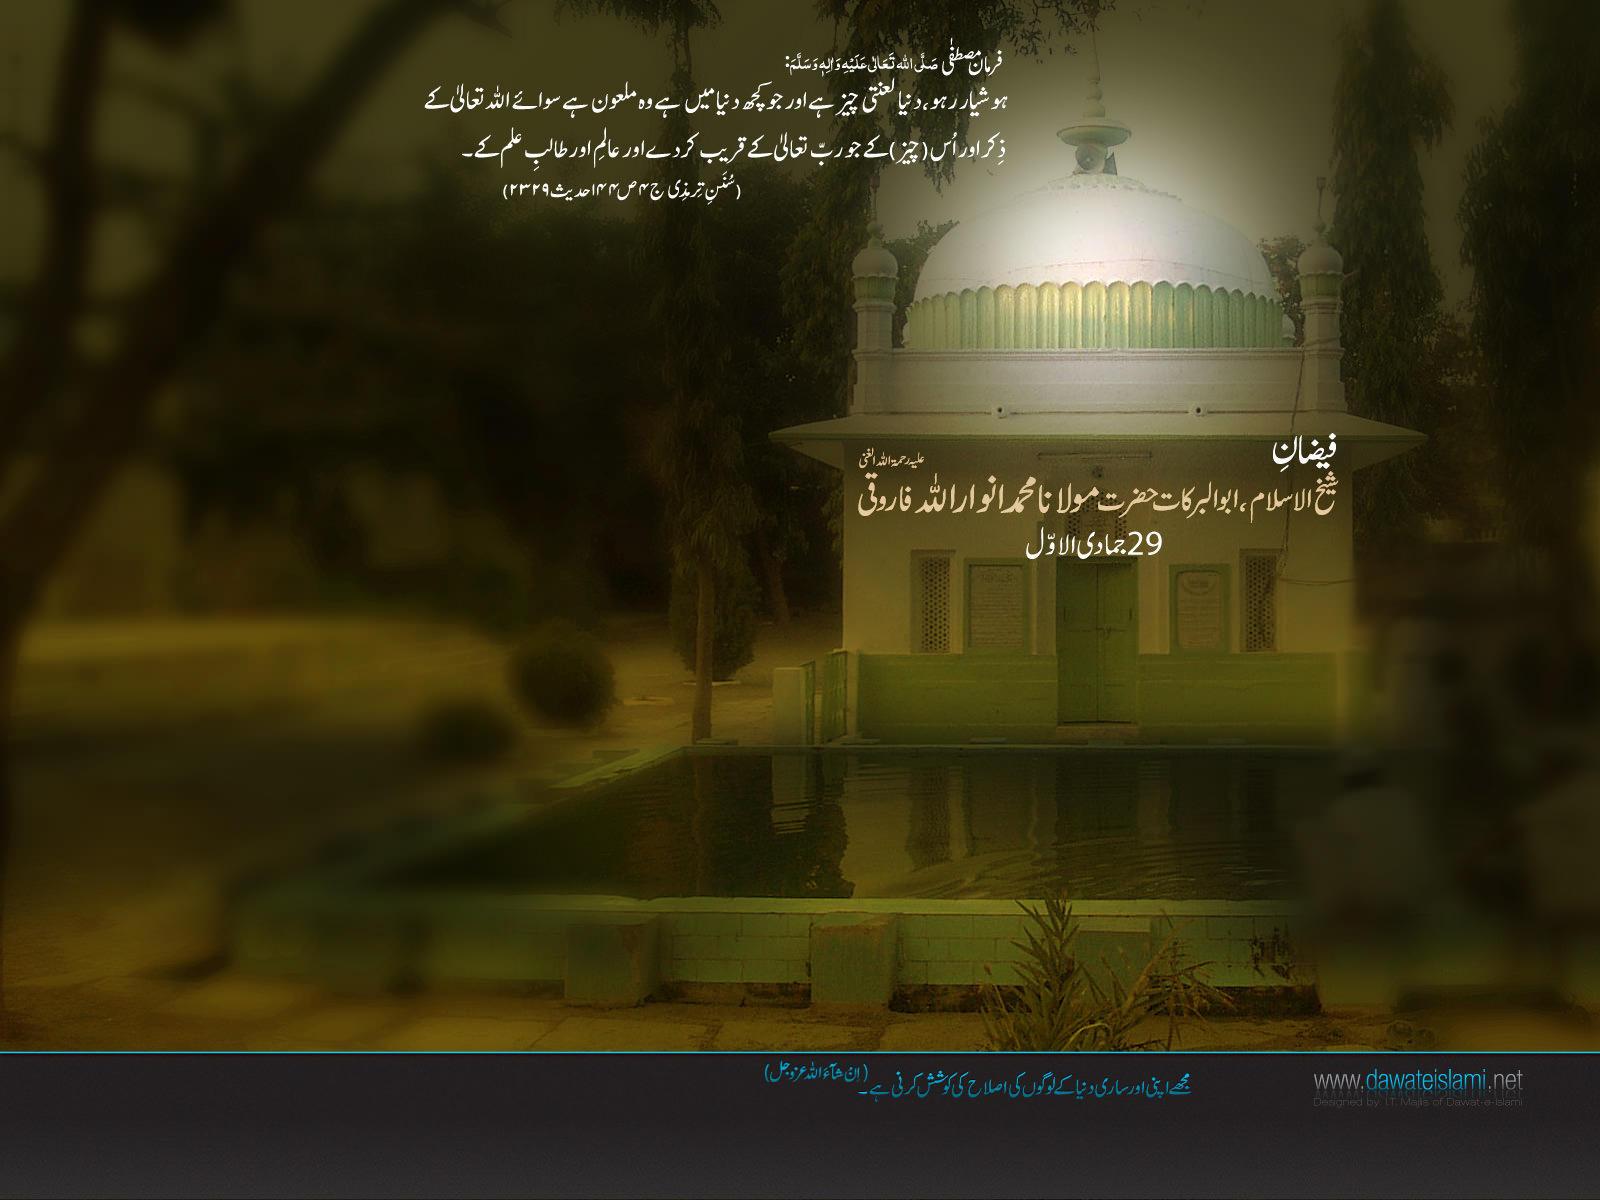 Wallpaper Moulana Muhammad Anwarullah faroqi